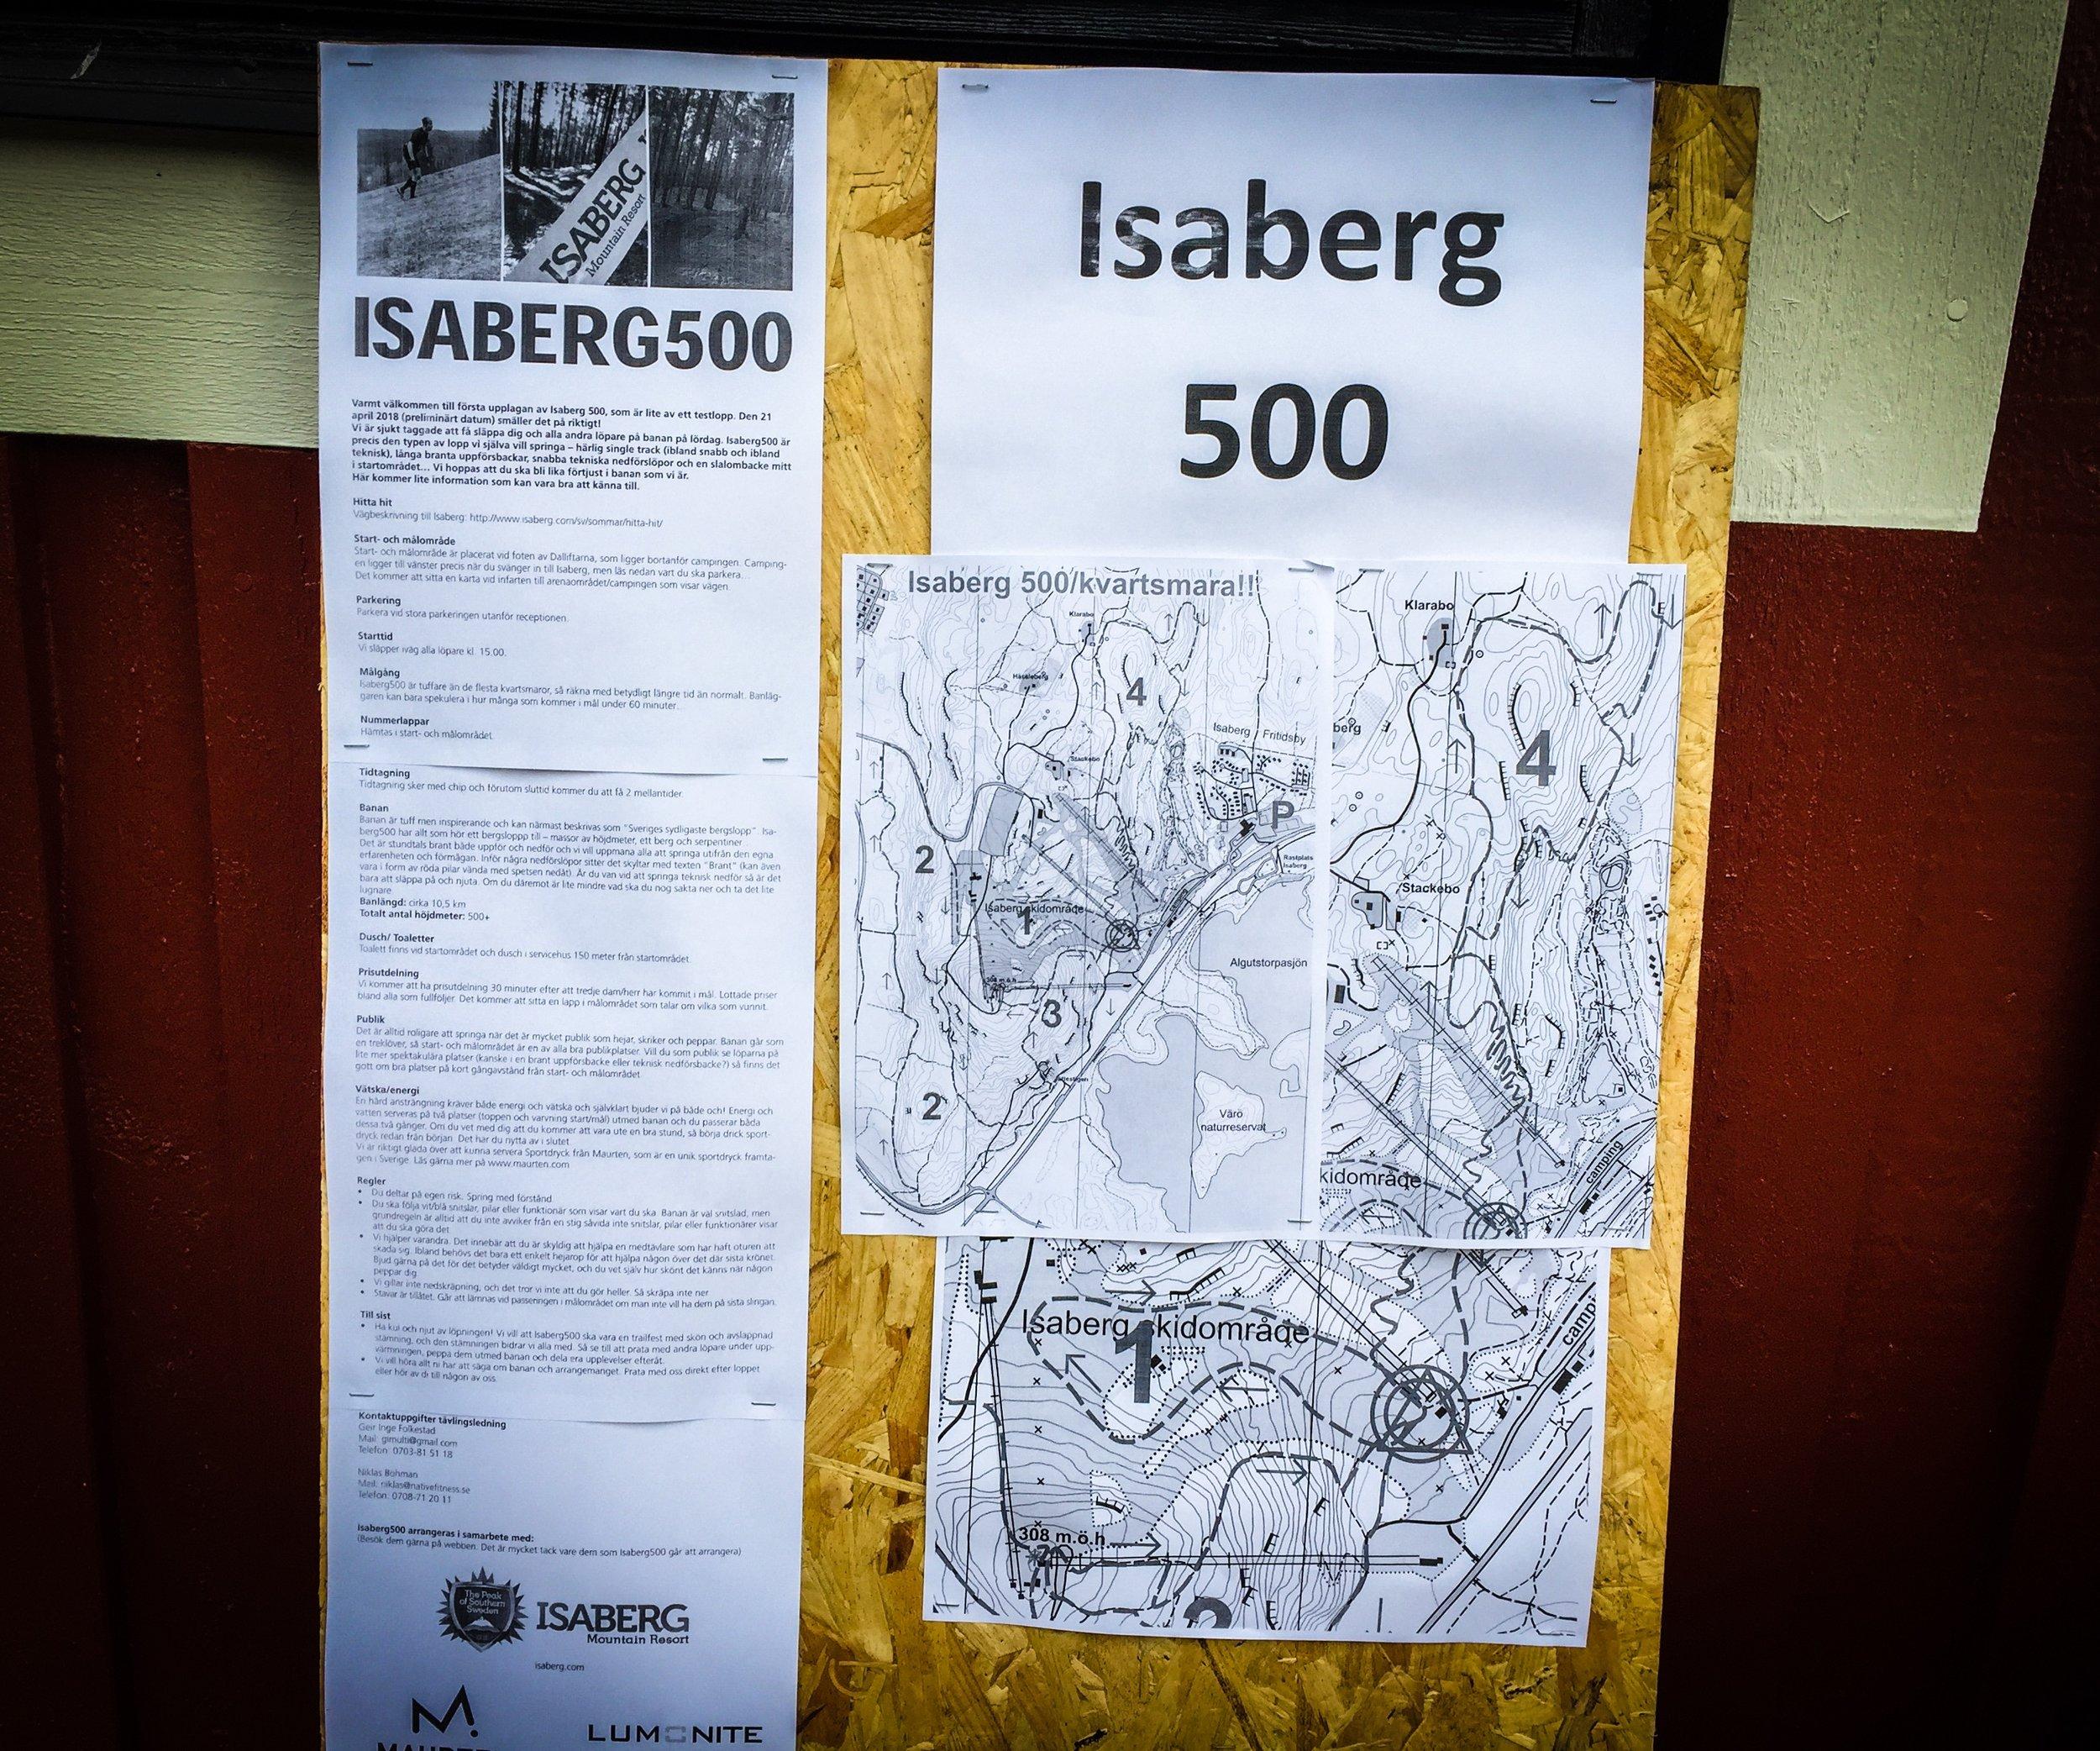 isaberg500.jpg